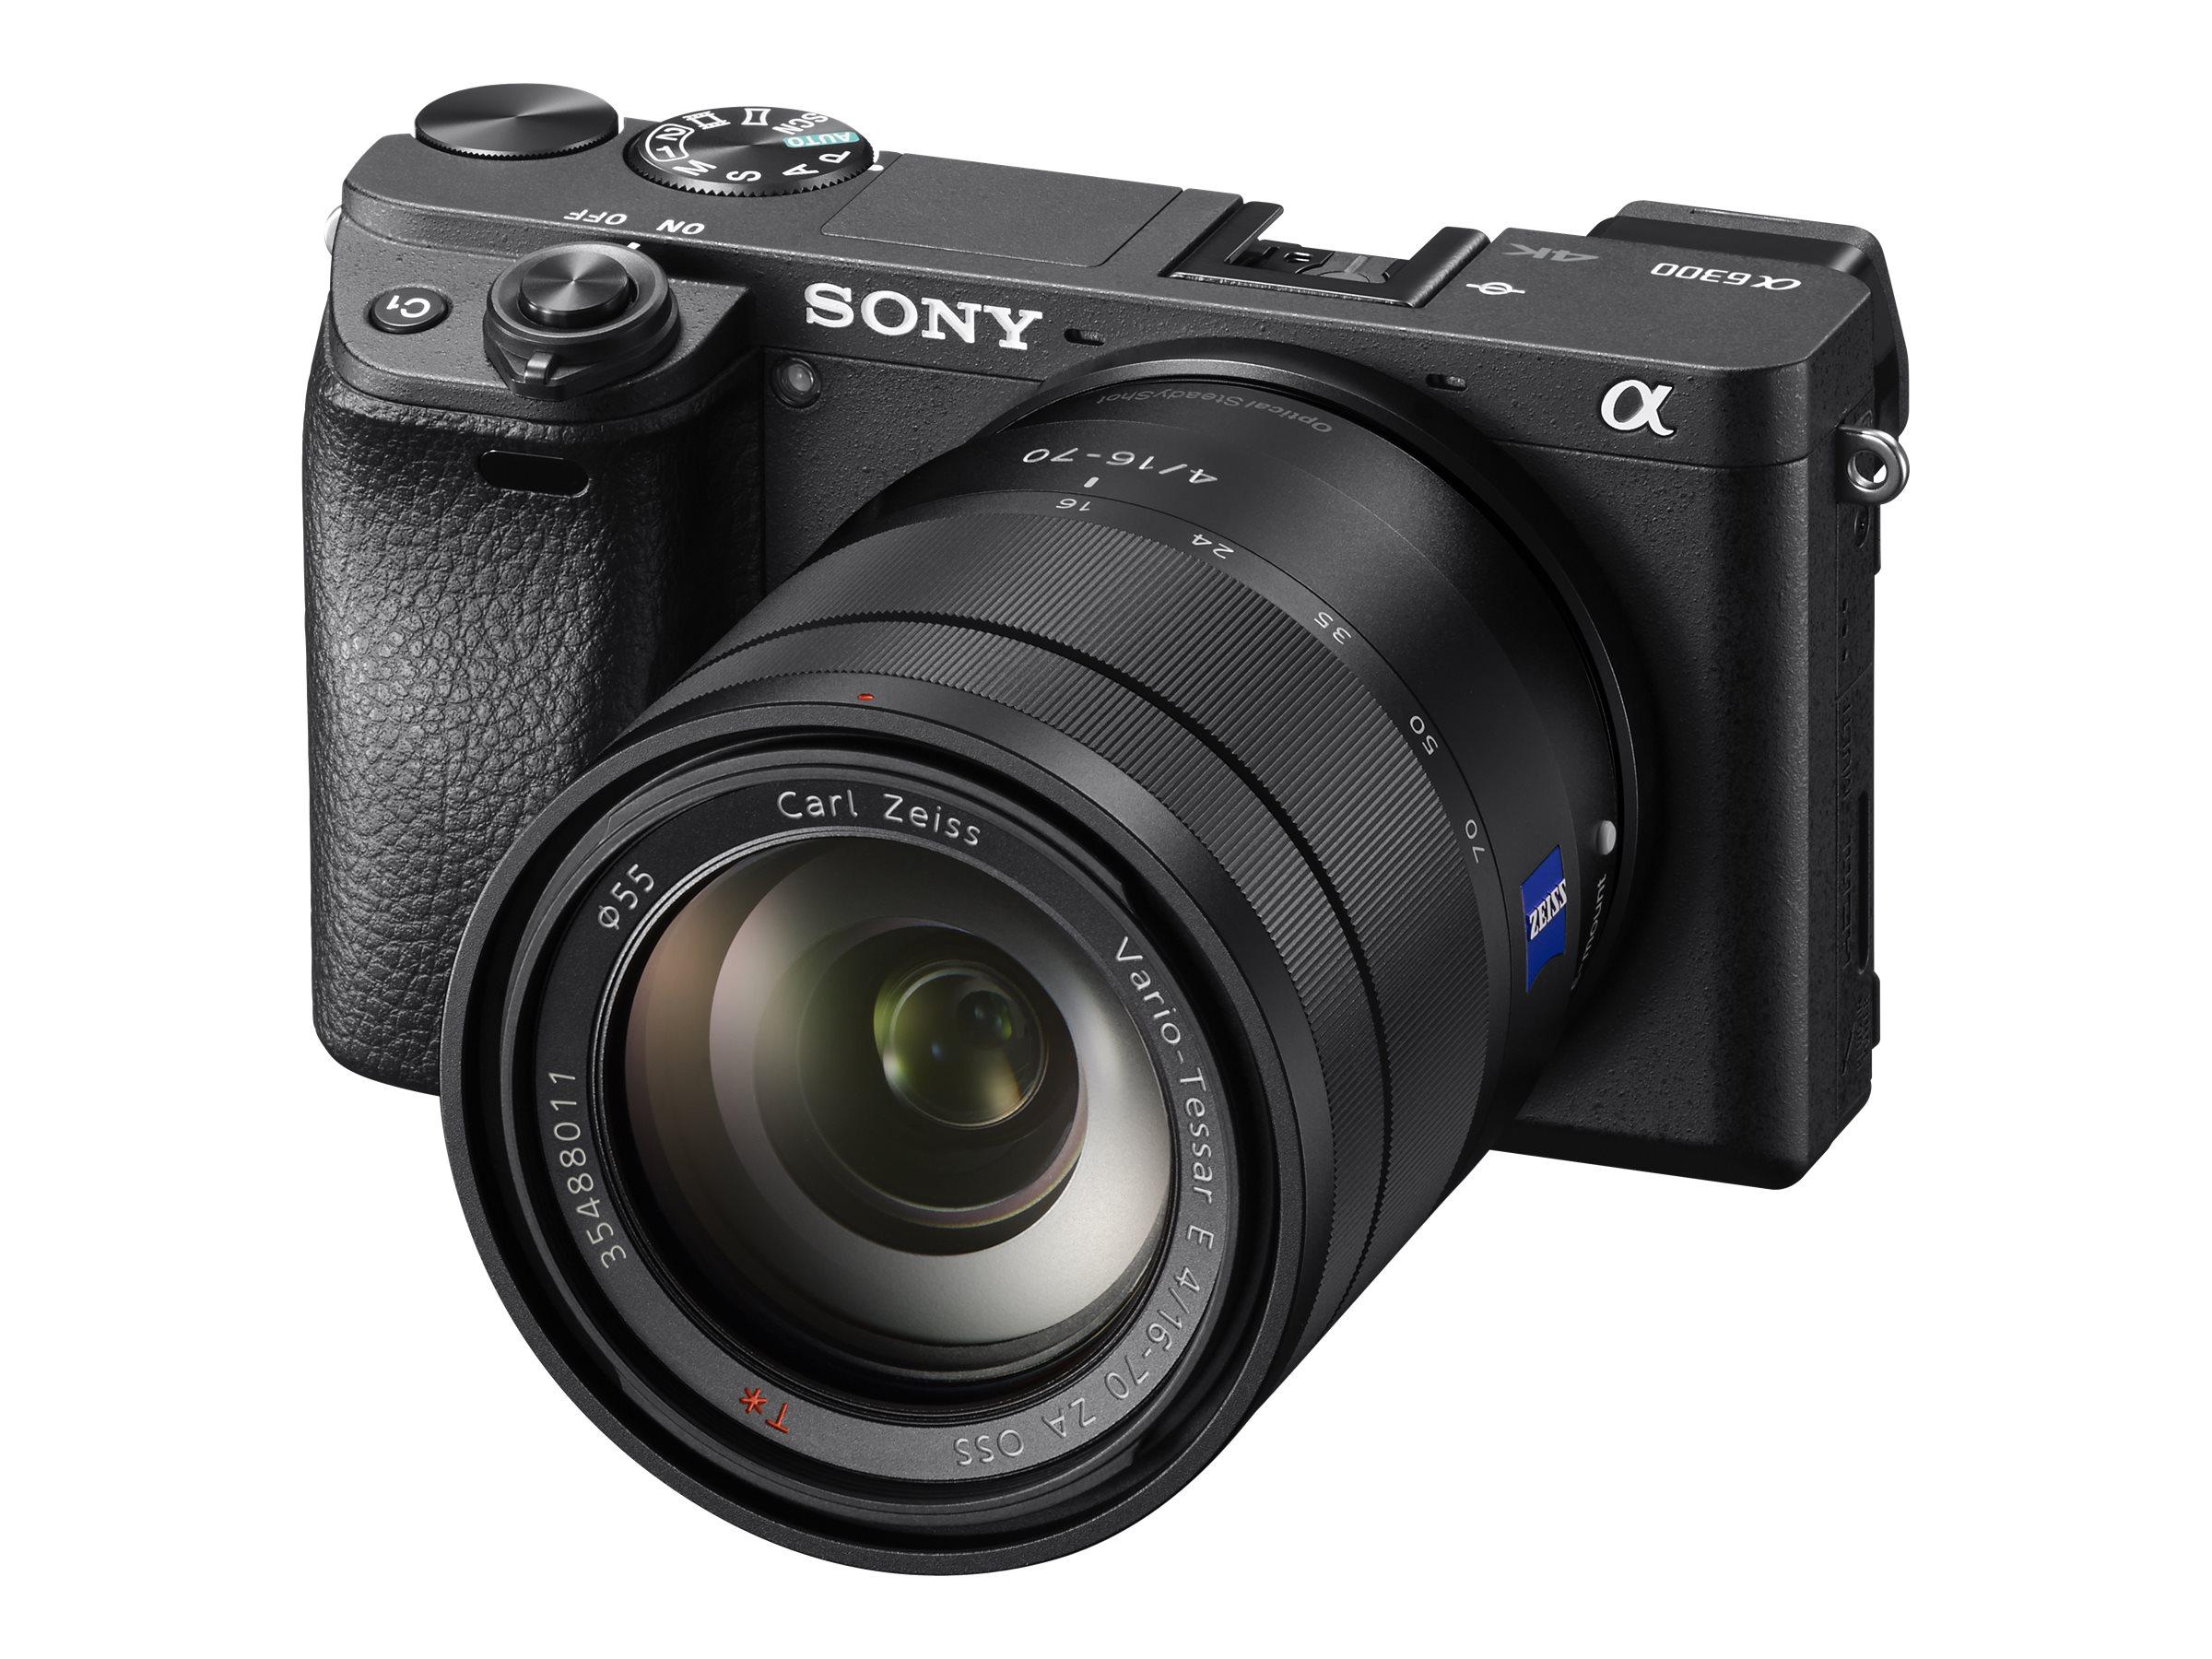 Sony a6300 ILCE-6300 - Digitalkamera - spiegellos - 24.2 MPix - APS-C - 4K / 30 BpS